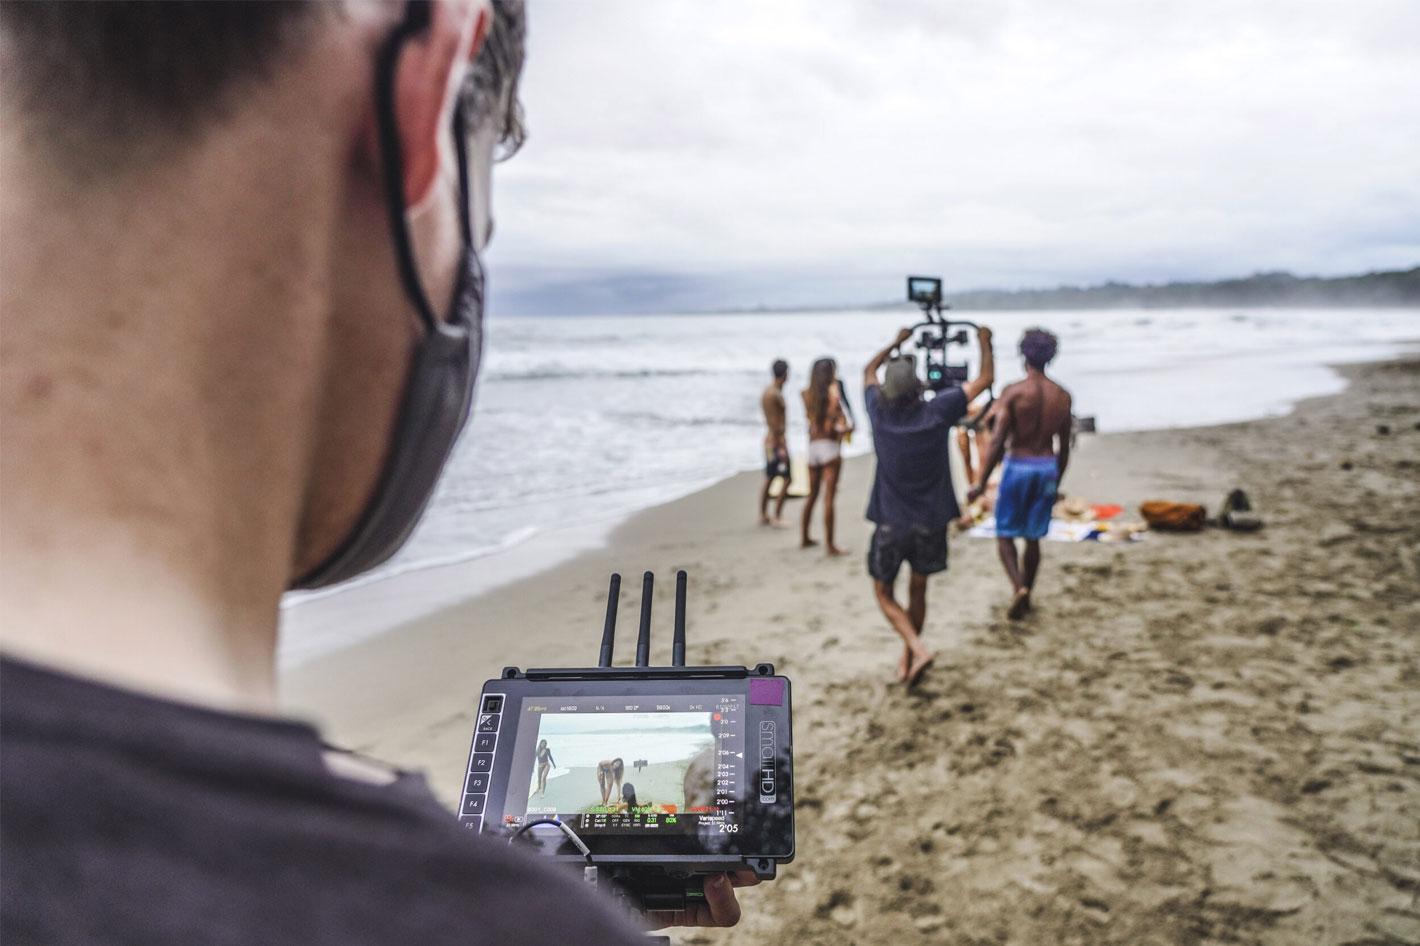 Adventurer and filmmaker Renan Ozturk on why he uses Teradek 3